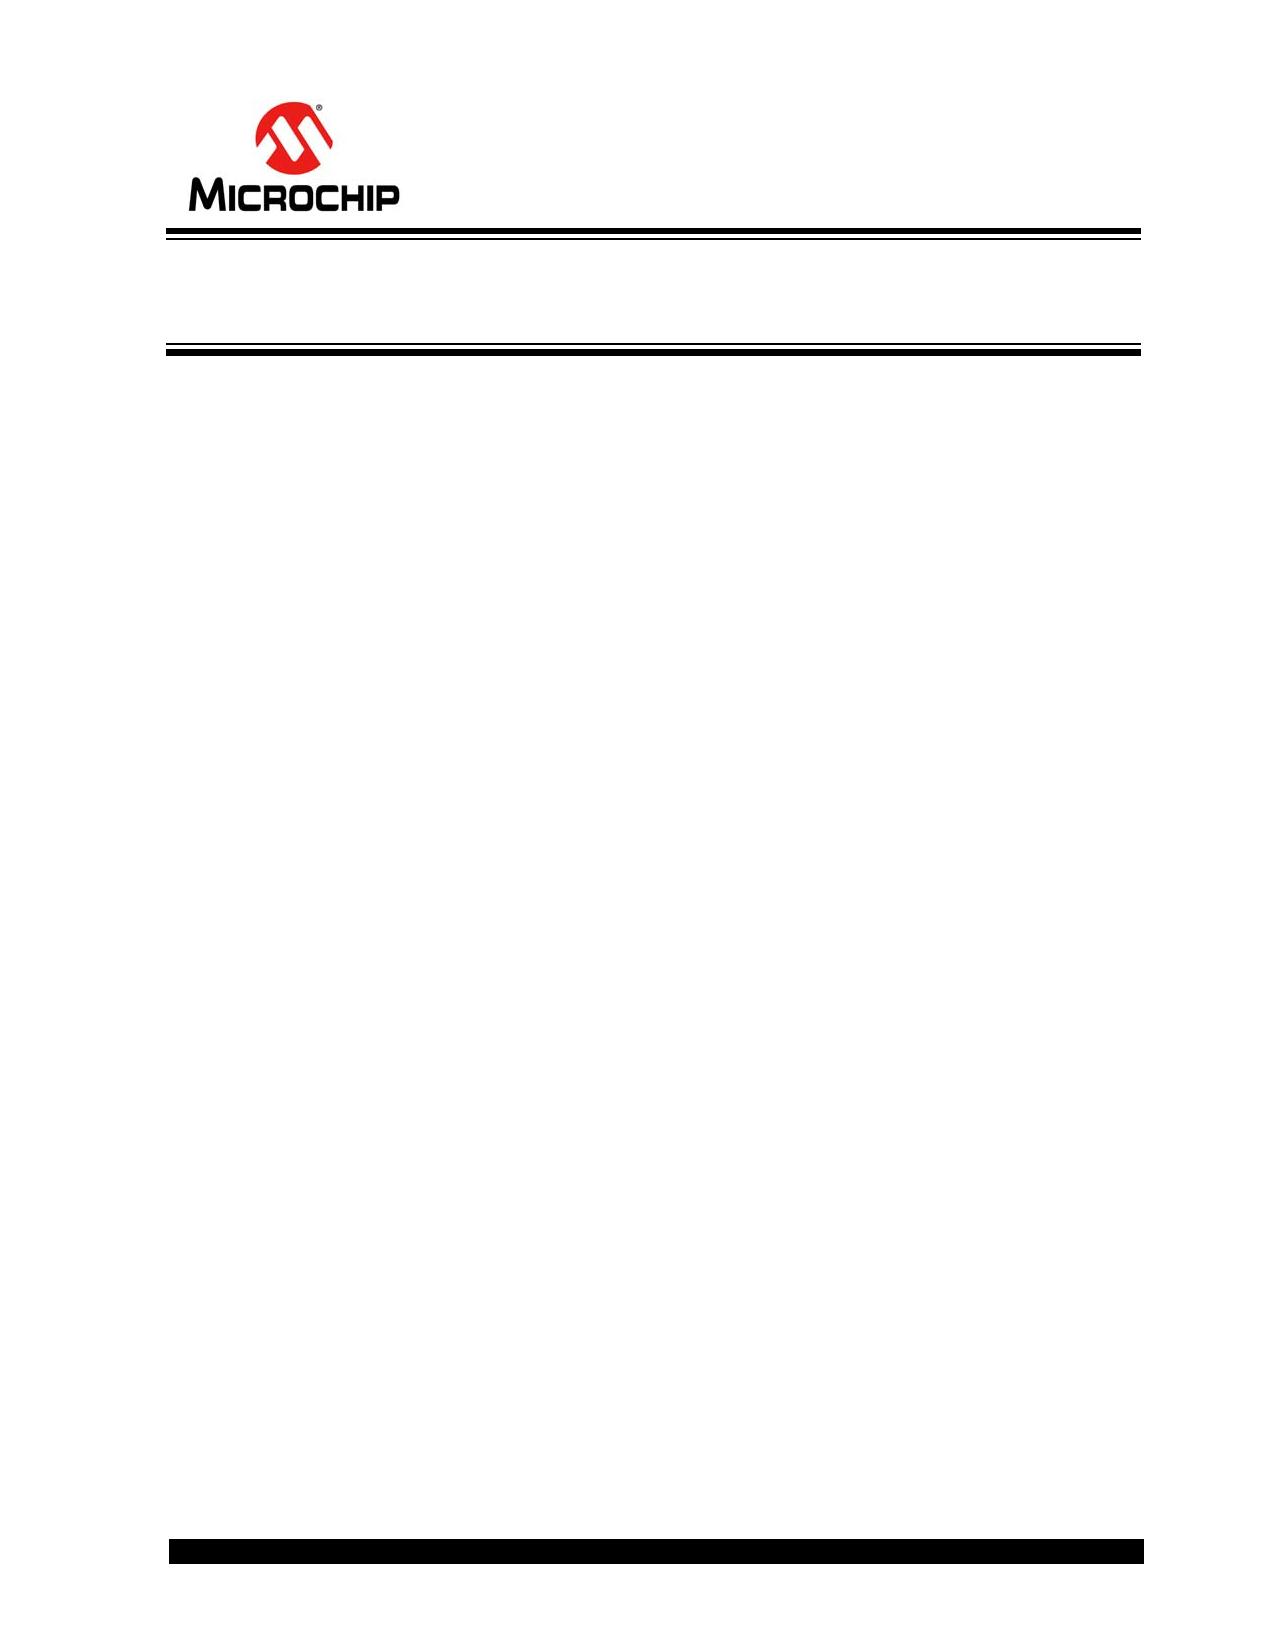 PIC24F32KA302 데이터시트 및 PIC24F32KA302 PDF